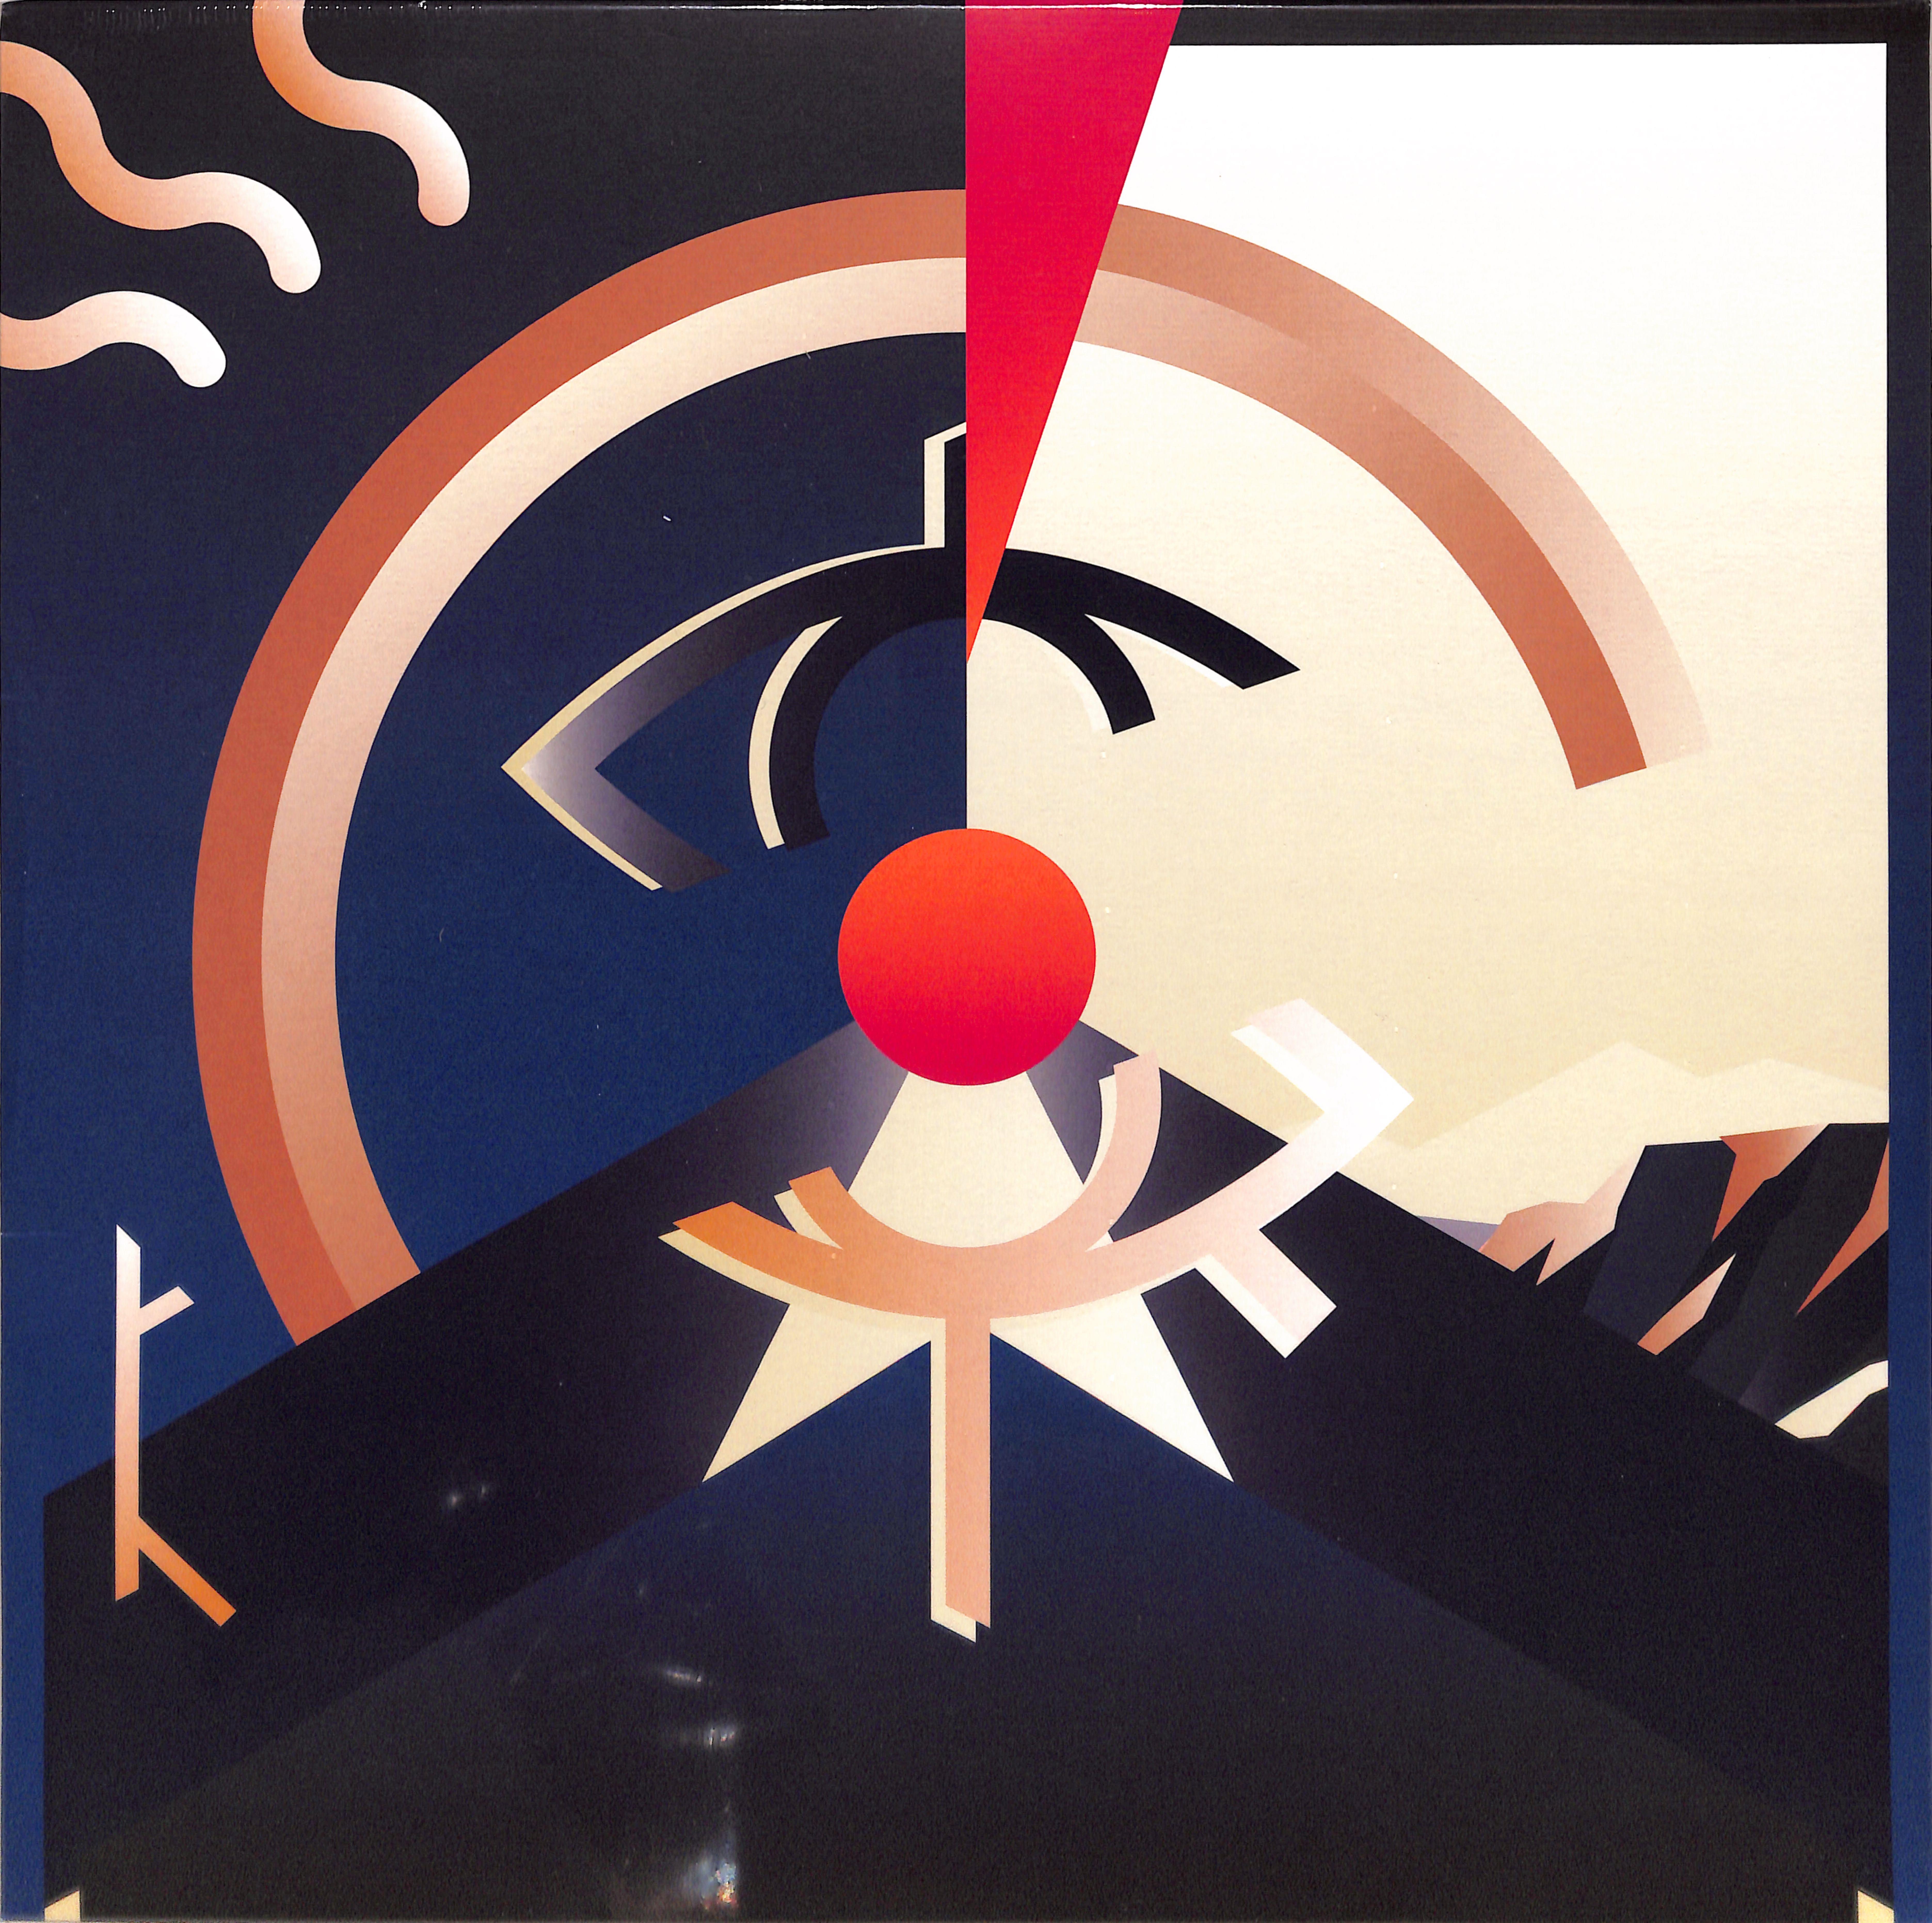 Aerial - SHIMMER EP